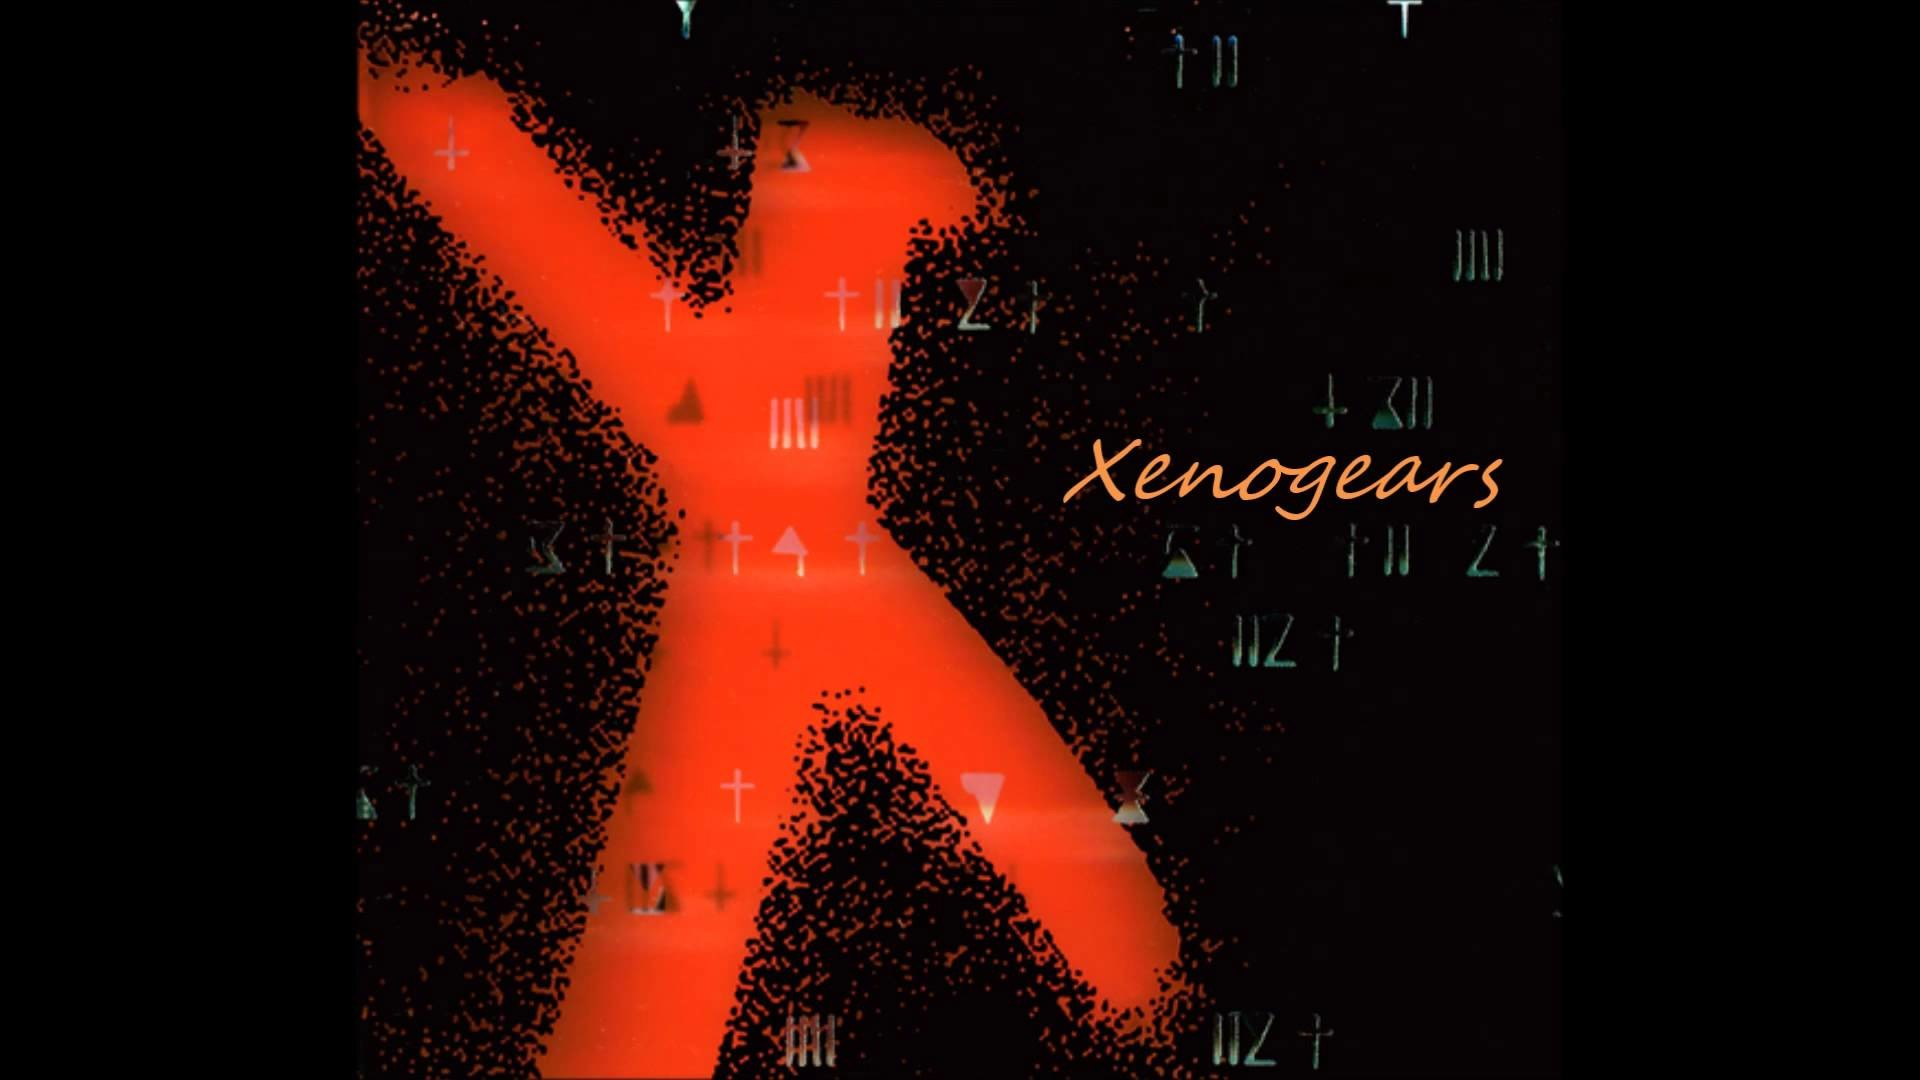 Xenogears – Ps1 Soundtrack 2-12 – Slumber (Long Version)